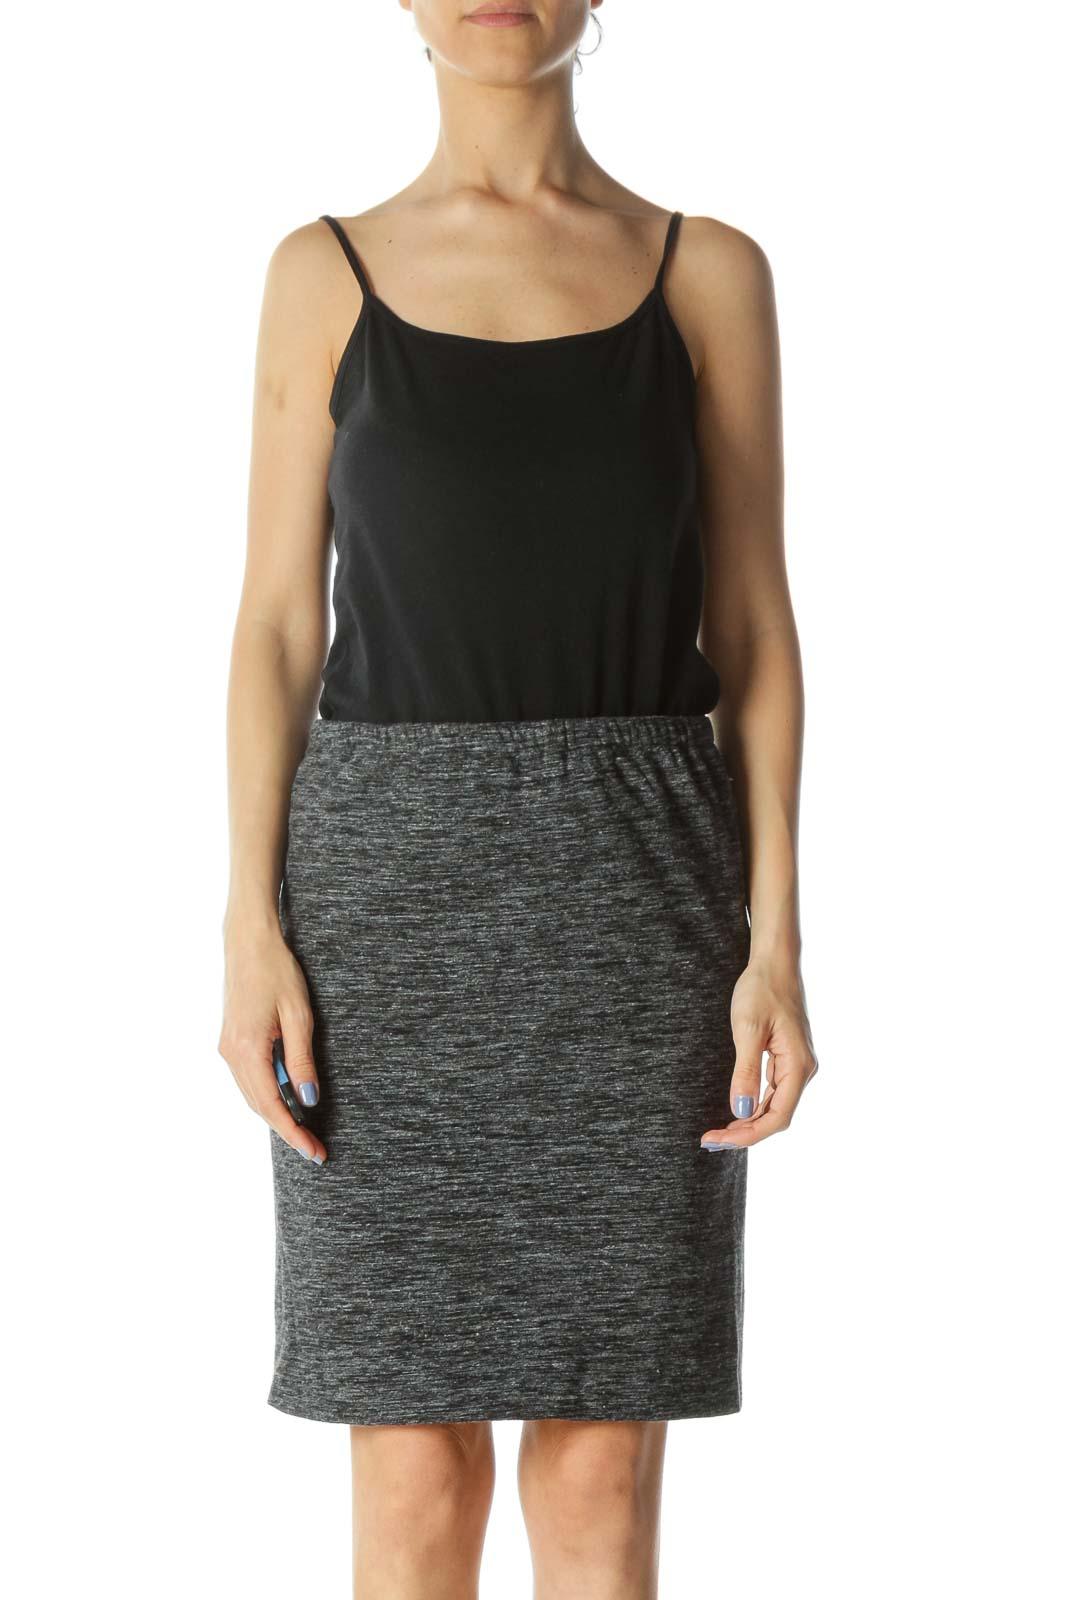 Heather Gray Designer Wool-Blend Knit Pencil Skirt Front